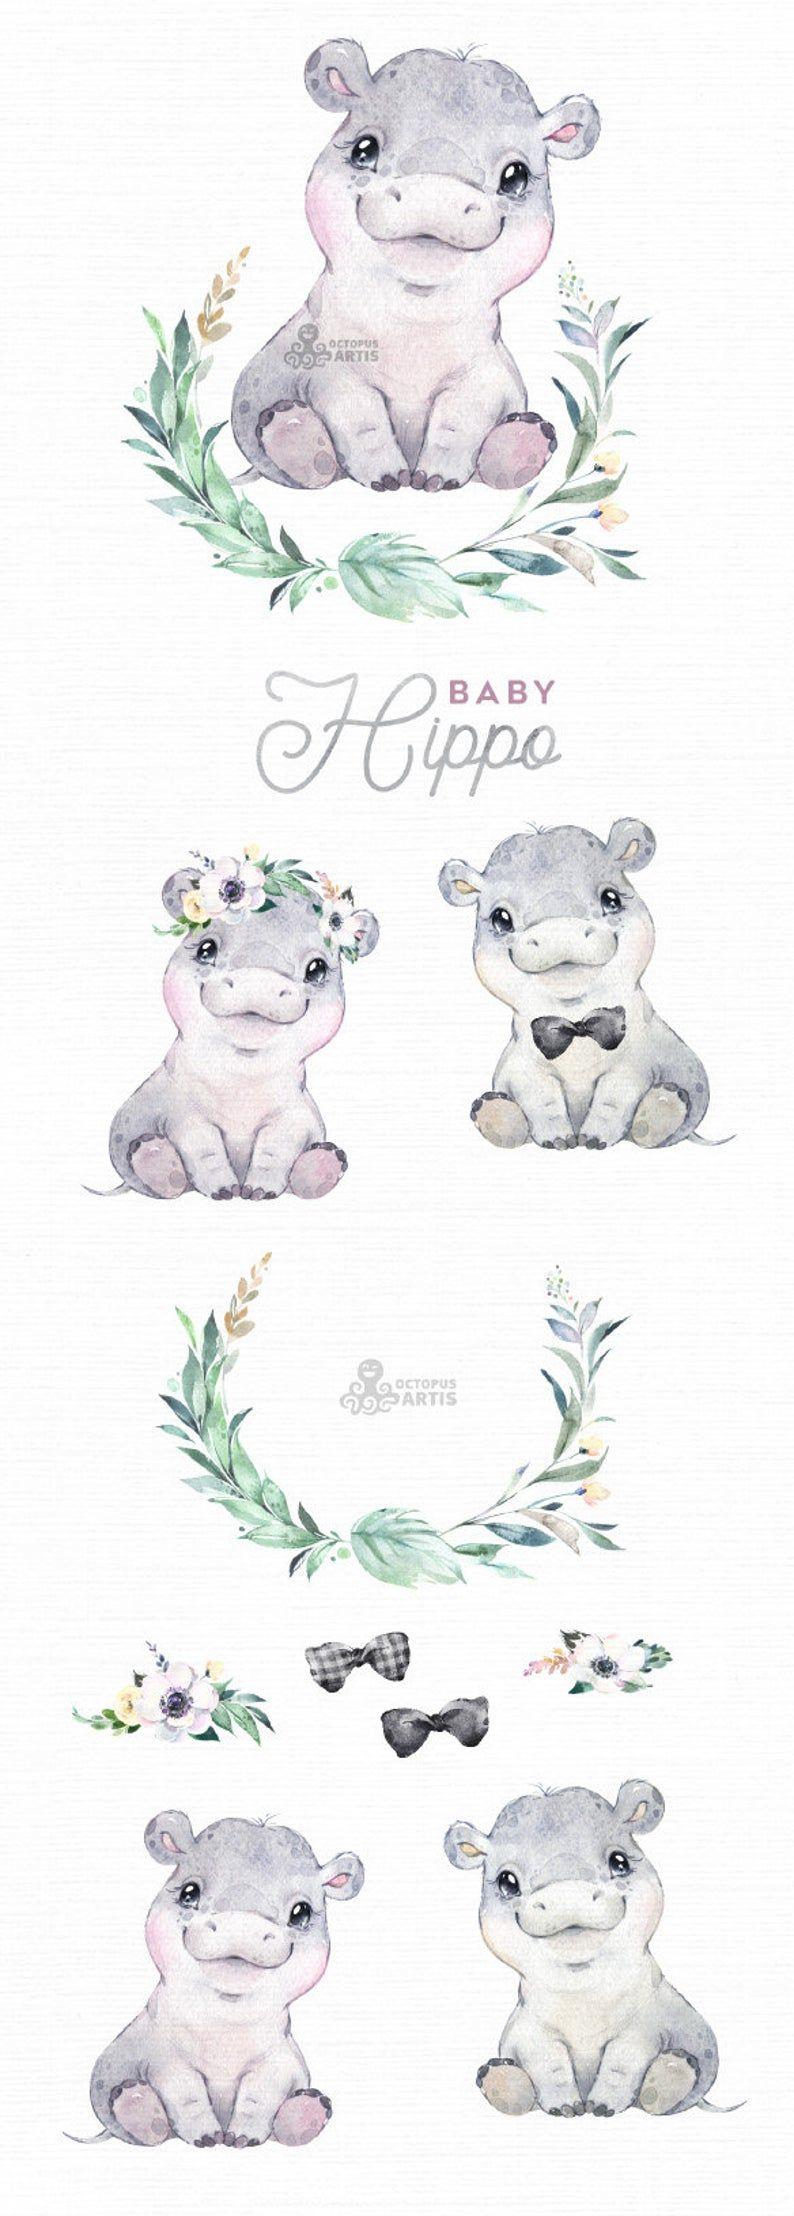 Baby Hippo. Watercolor little animal clipart, babies, flowers, safari, digital, Africa, wreath, cute, nursery art, baby-shower, boy, girl